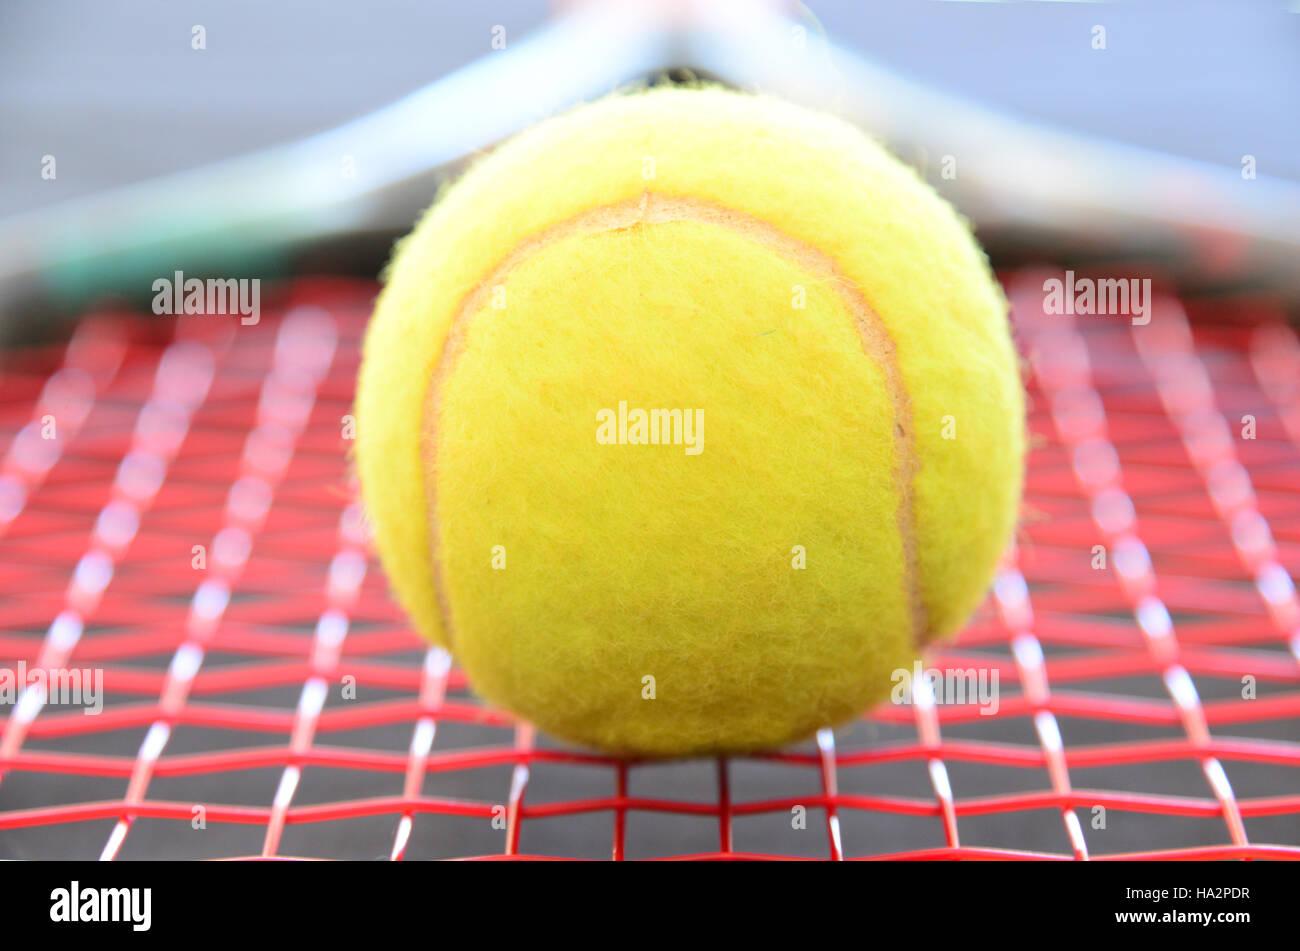 Close-up di una palla da tennis su una racchetta da tennis Immagini Stock